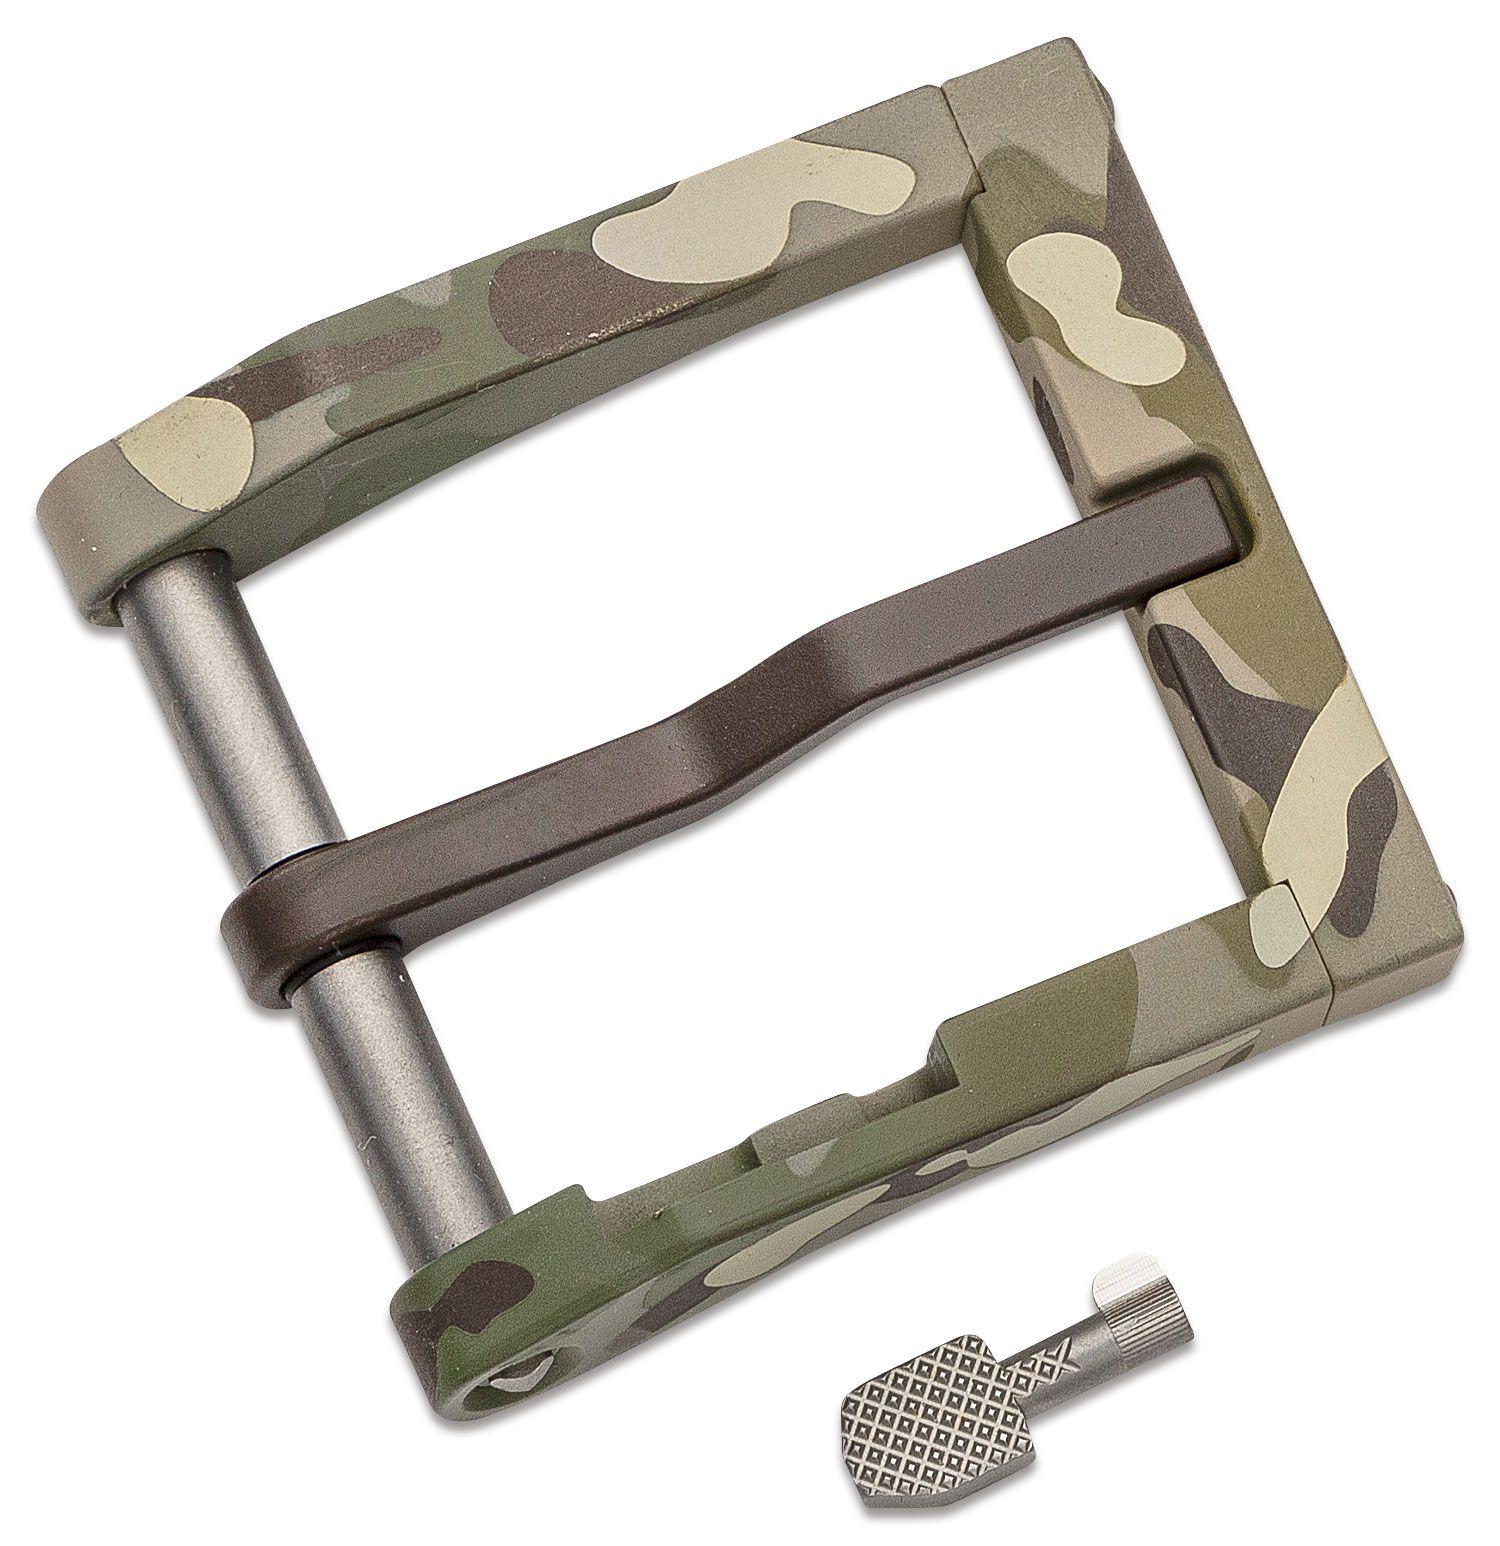 Blackside Customs Modular 1.5 inch Aluminum Belt Buckle with Cuff Key, Green Multi-Cam